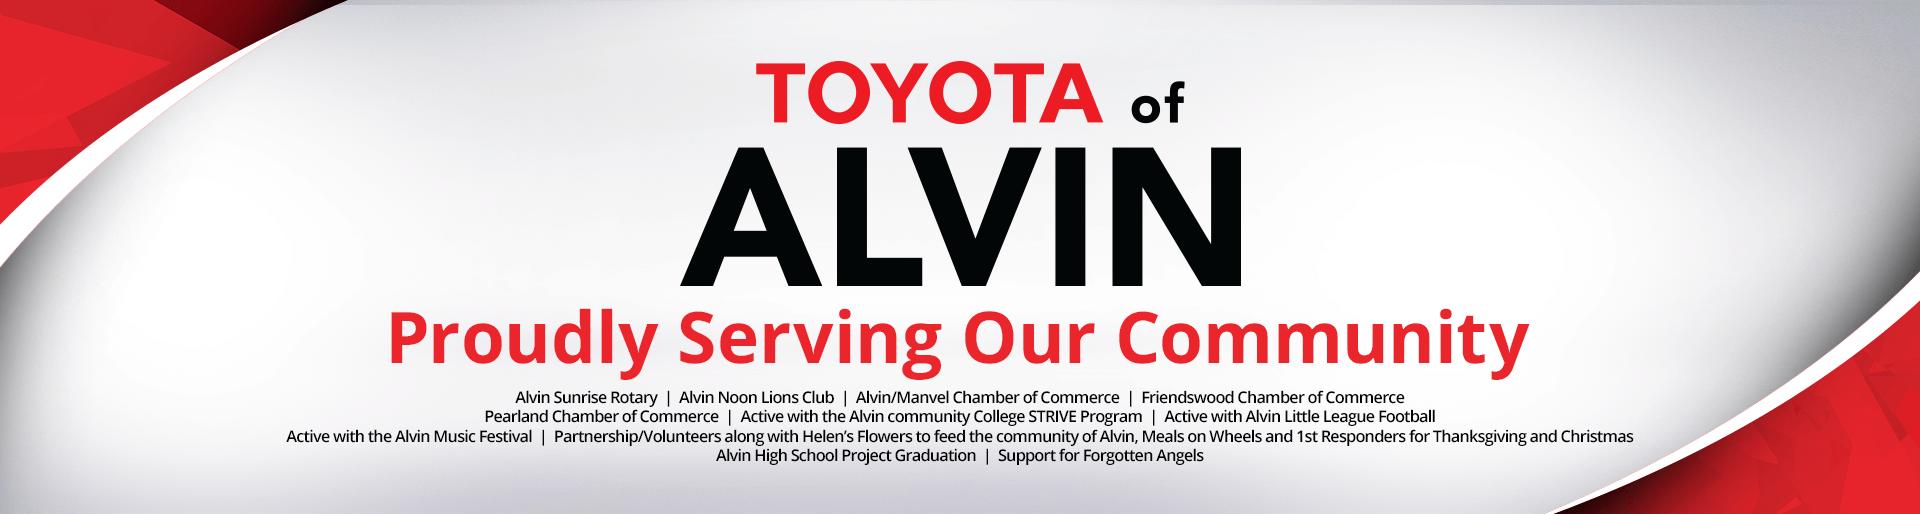 Community Toyota Baytown >> Toyota of Alvin | Toyota Dealer in Alvin, TX